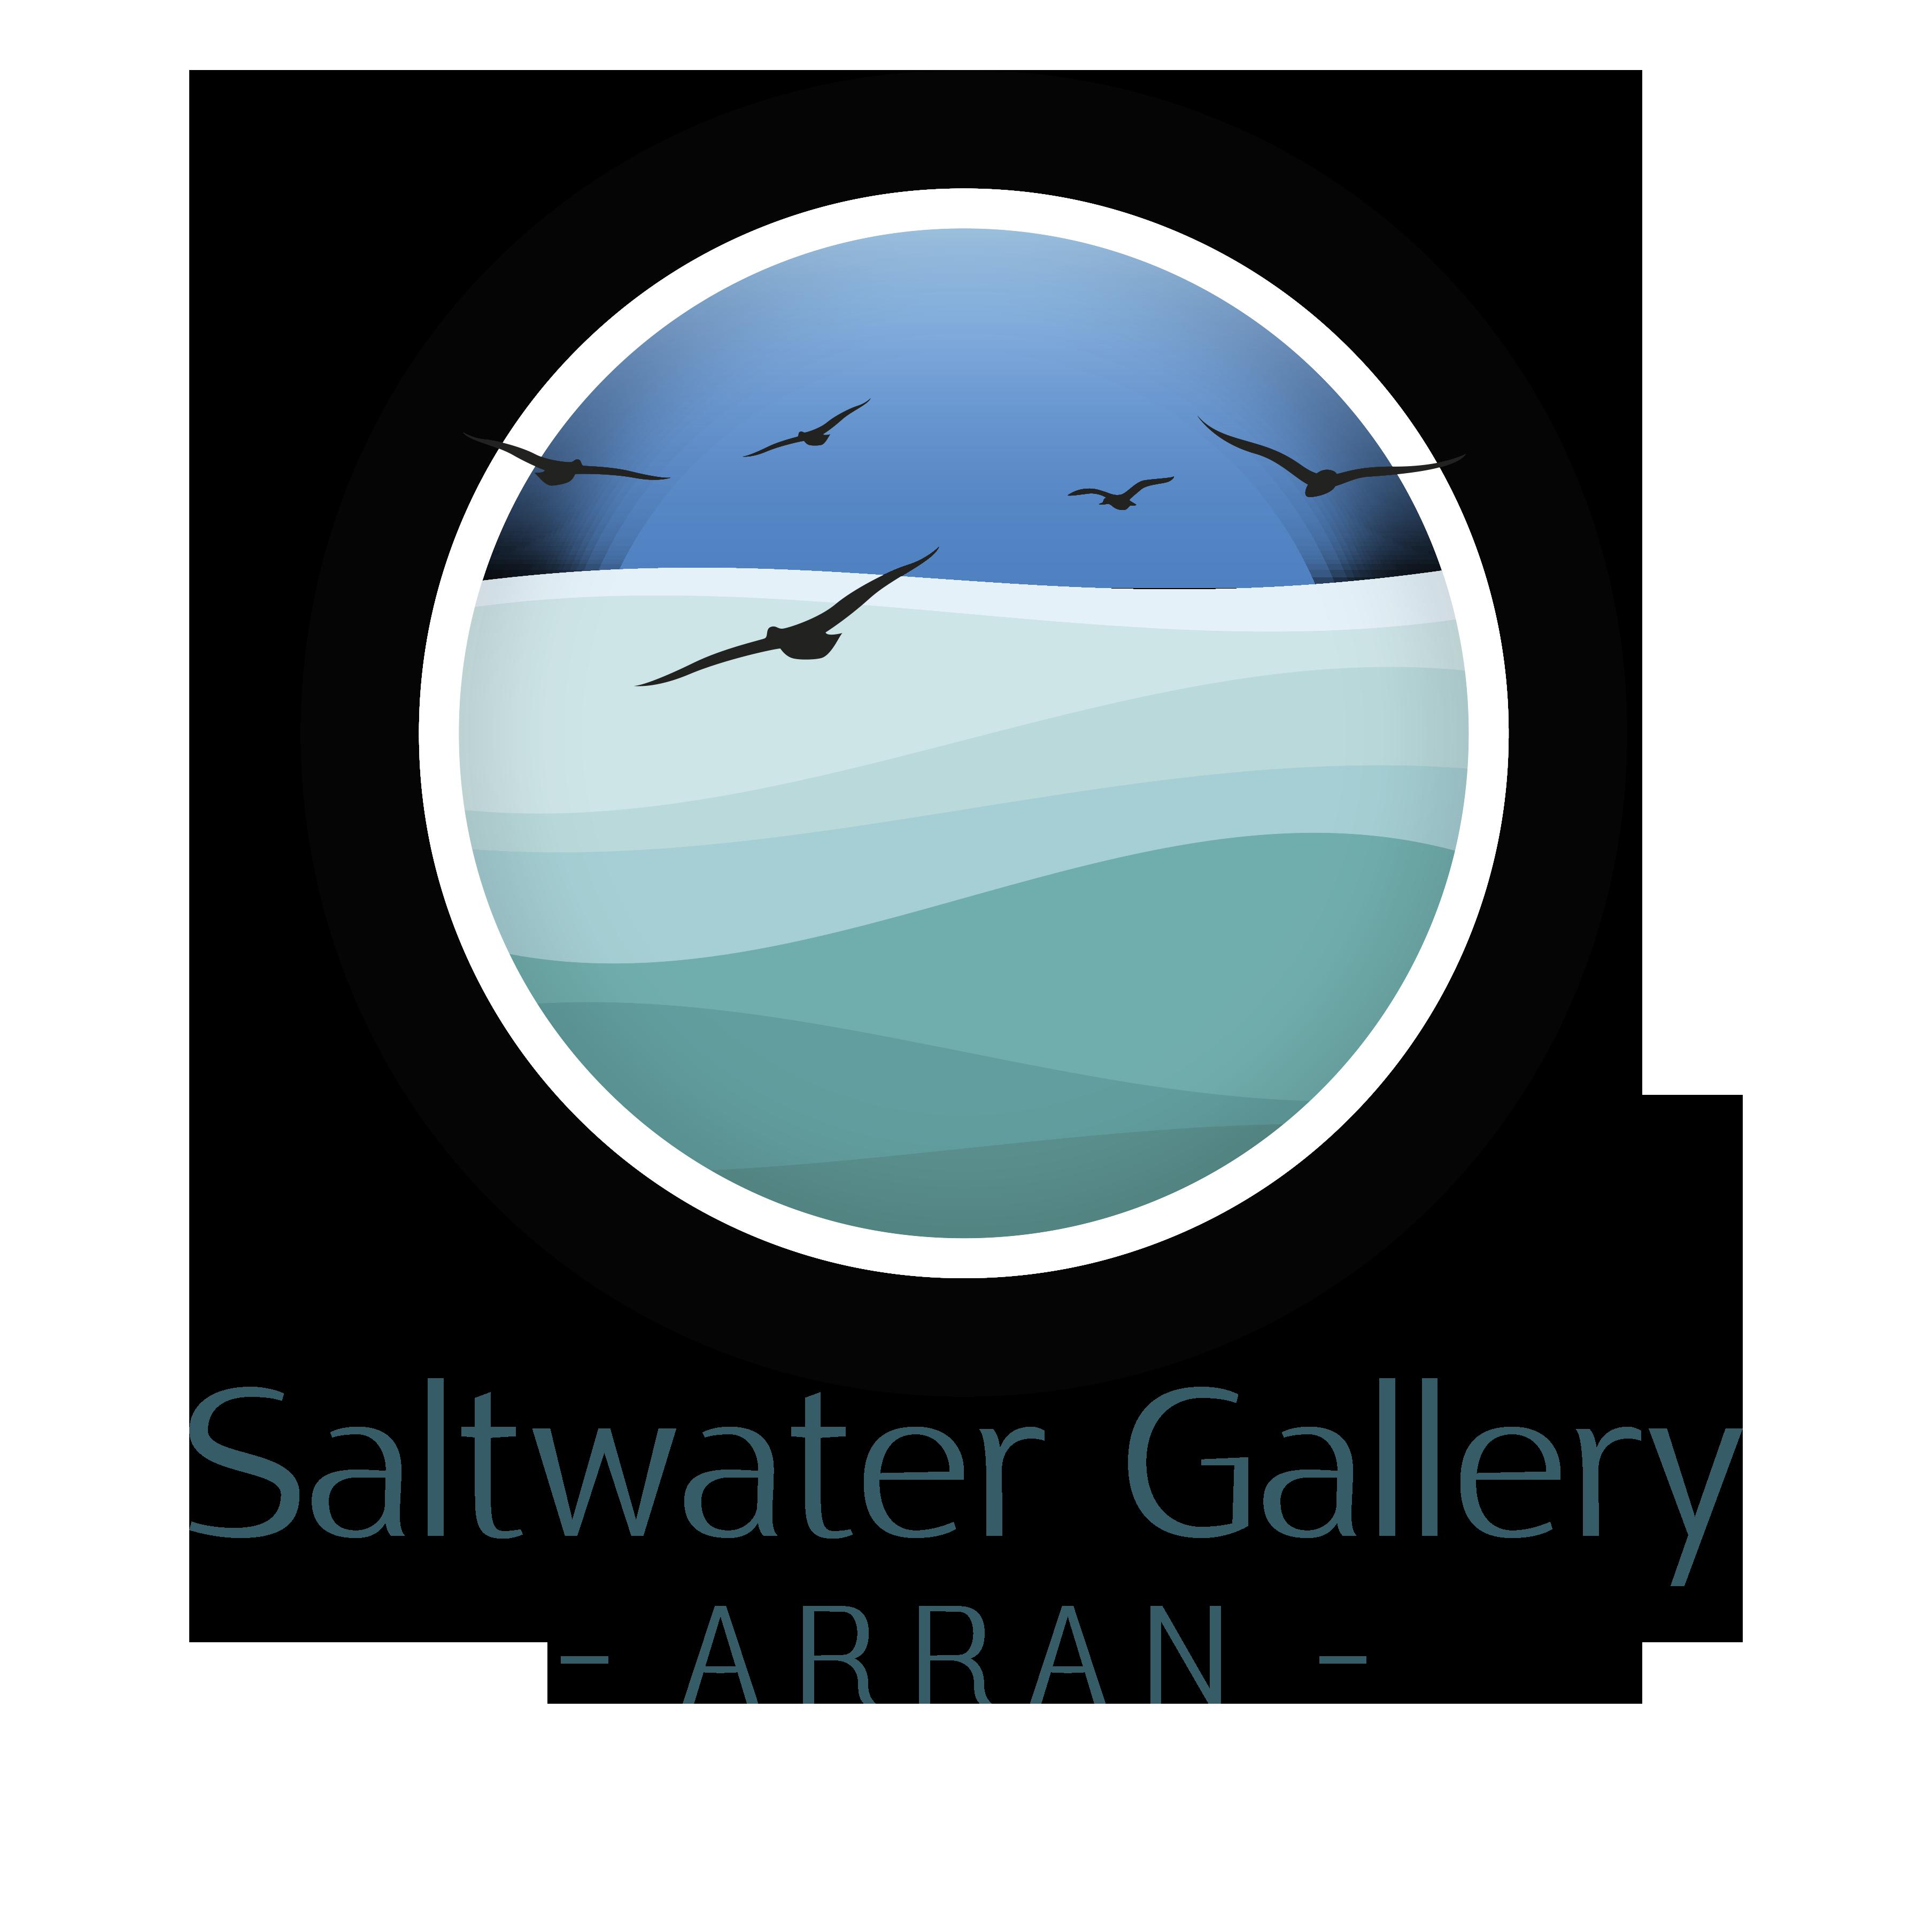 Saltwater Gallery